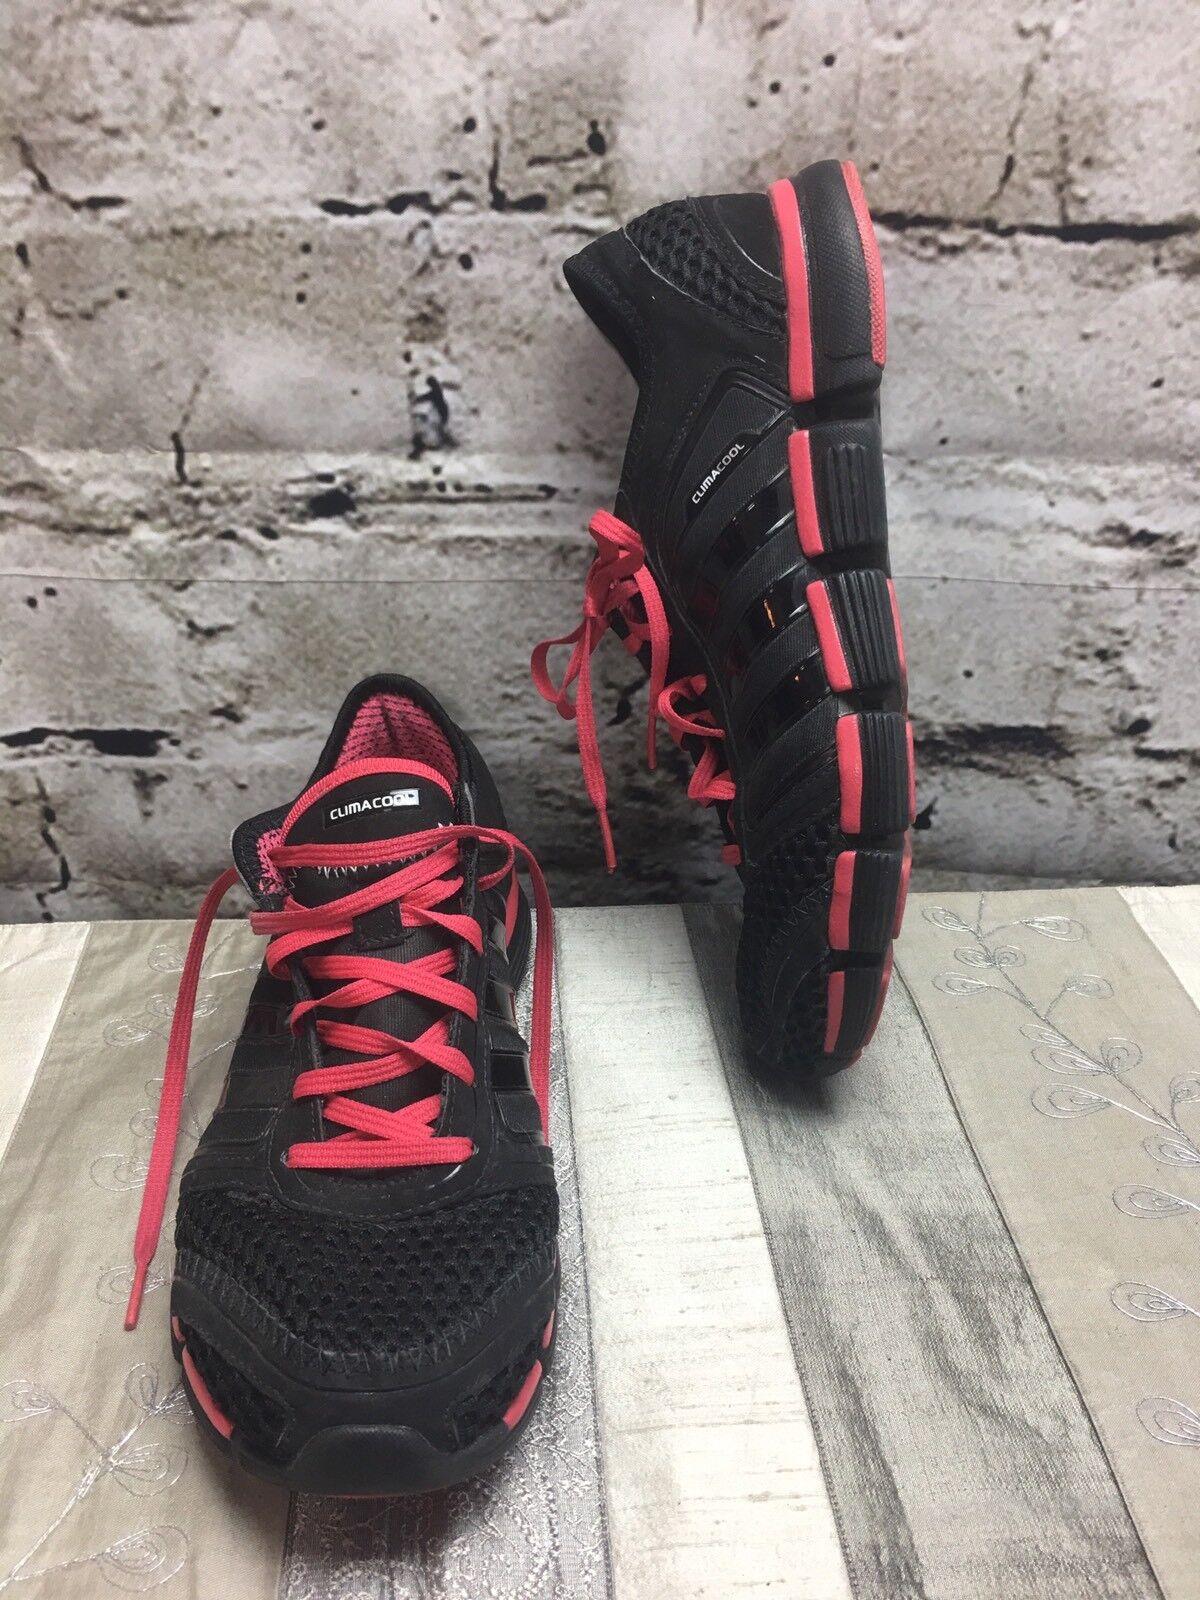 Adidas climacool sz 9,5 nero e scarpe da ginnastica telata rosa | unico  | Gentiluomo/Signora Scarpa